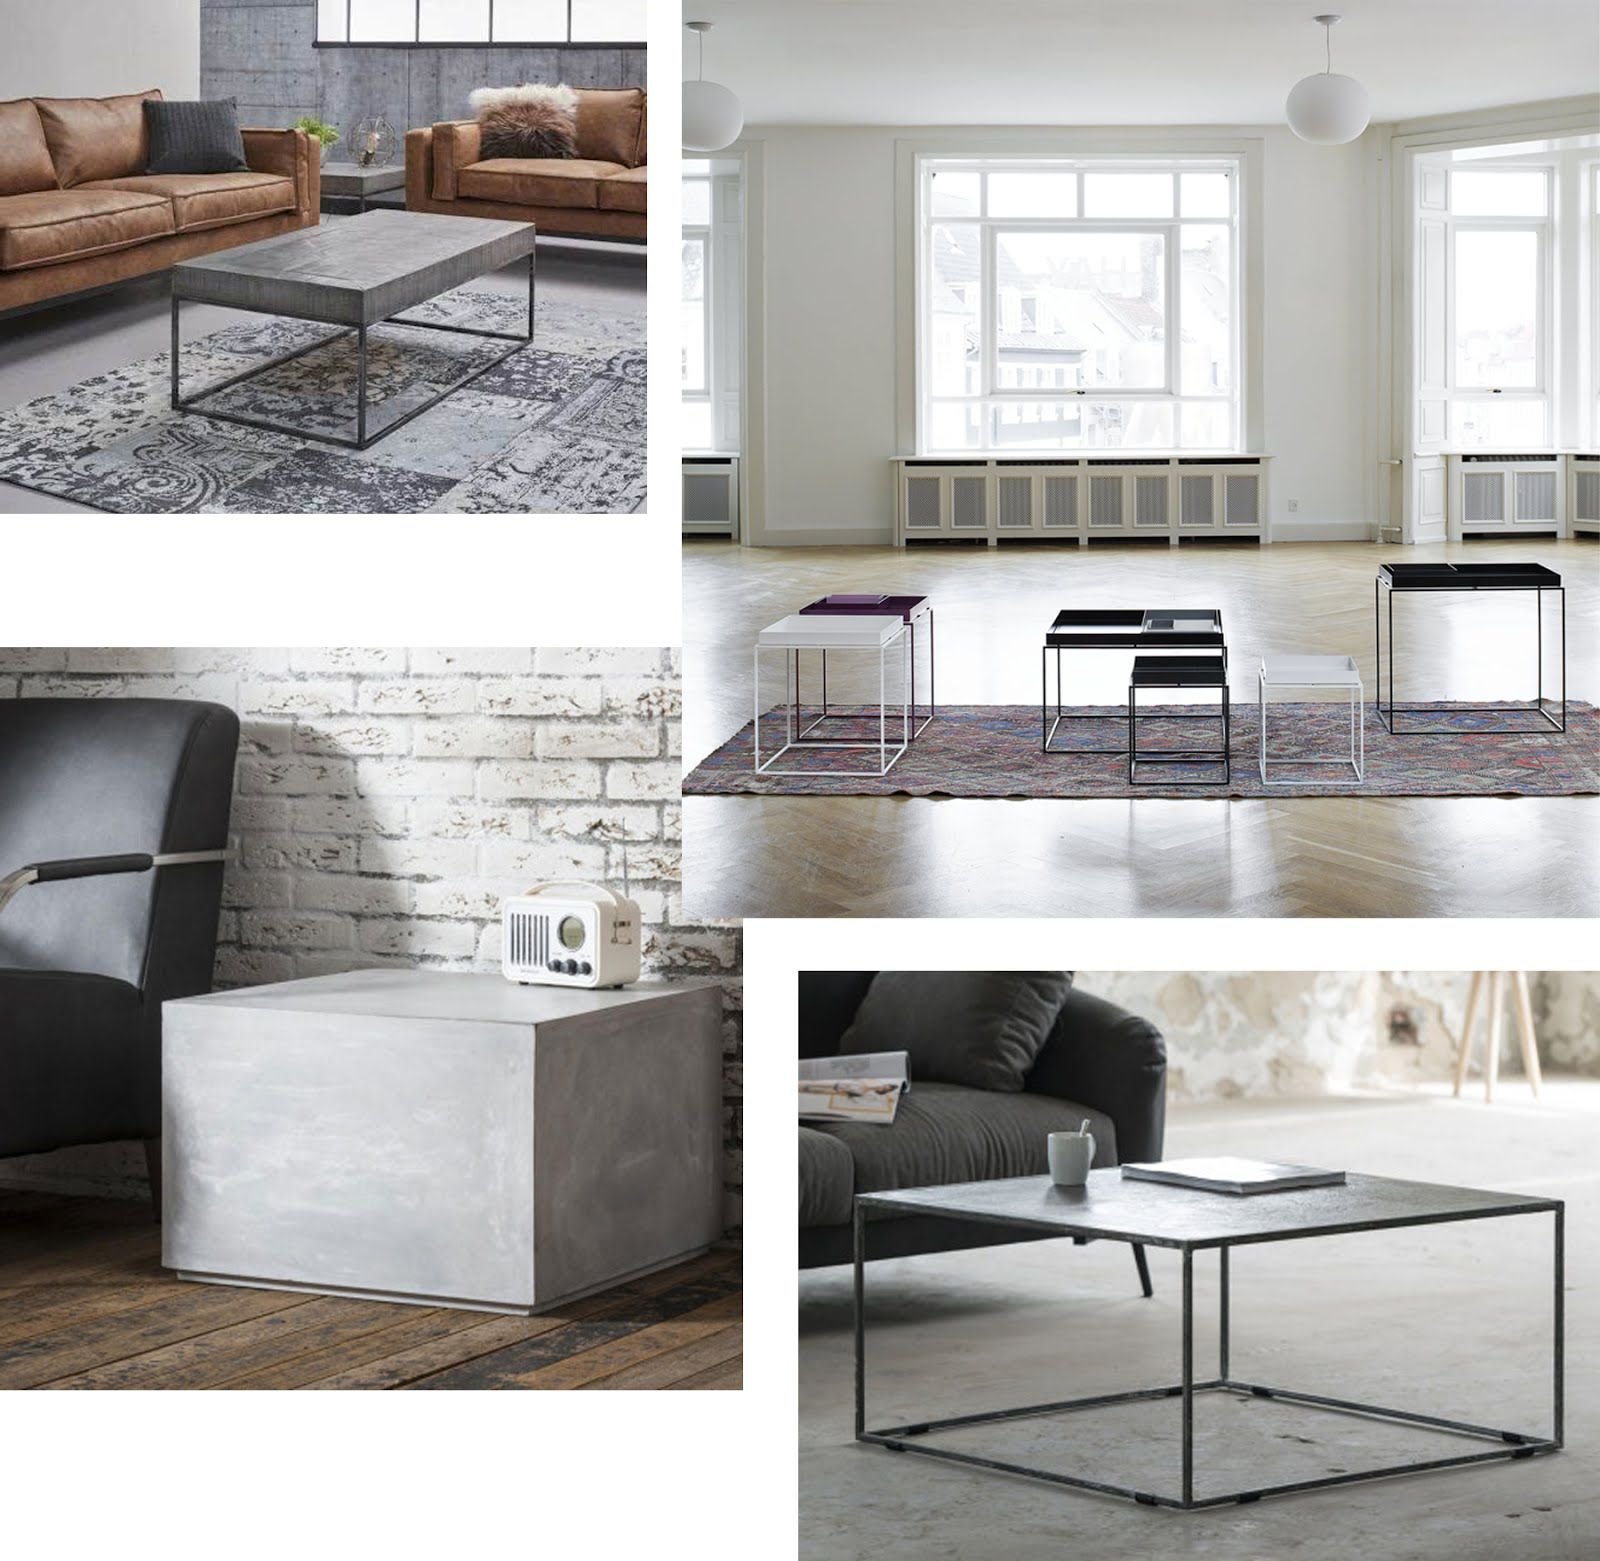 Betonlook Salon Tafel.Lions Home Interior Webshop Interieur Salon Tafel